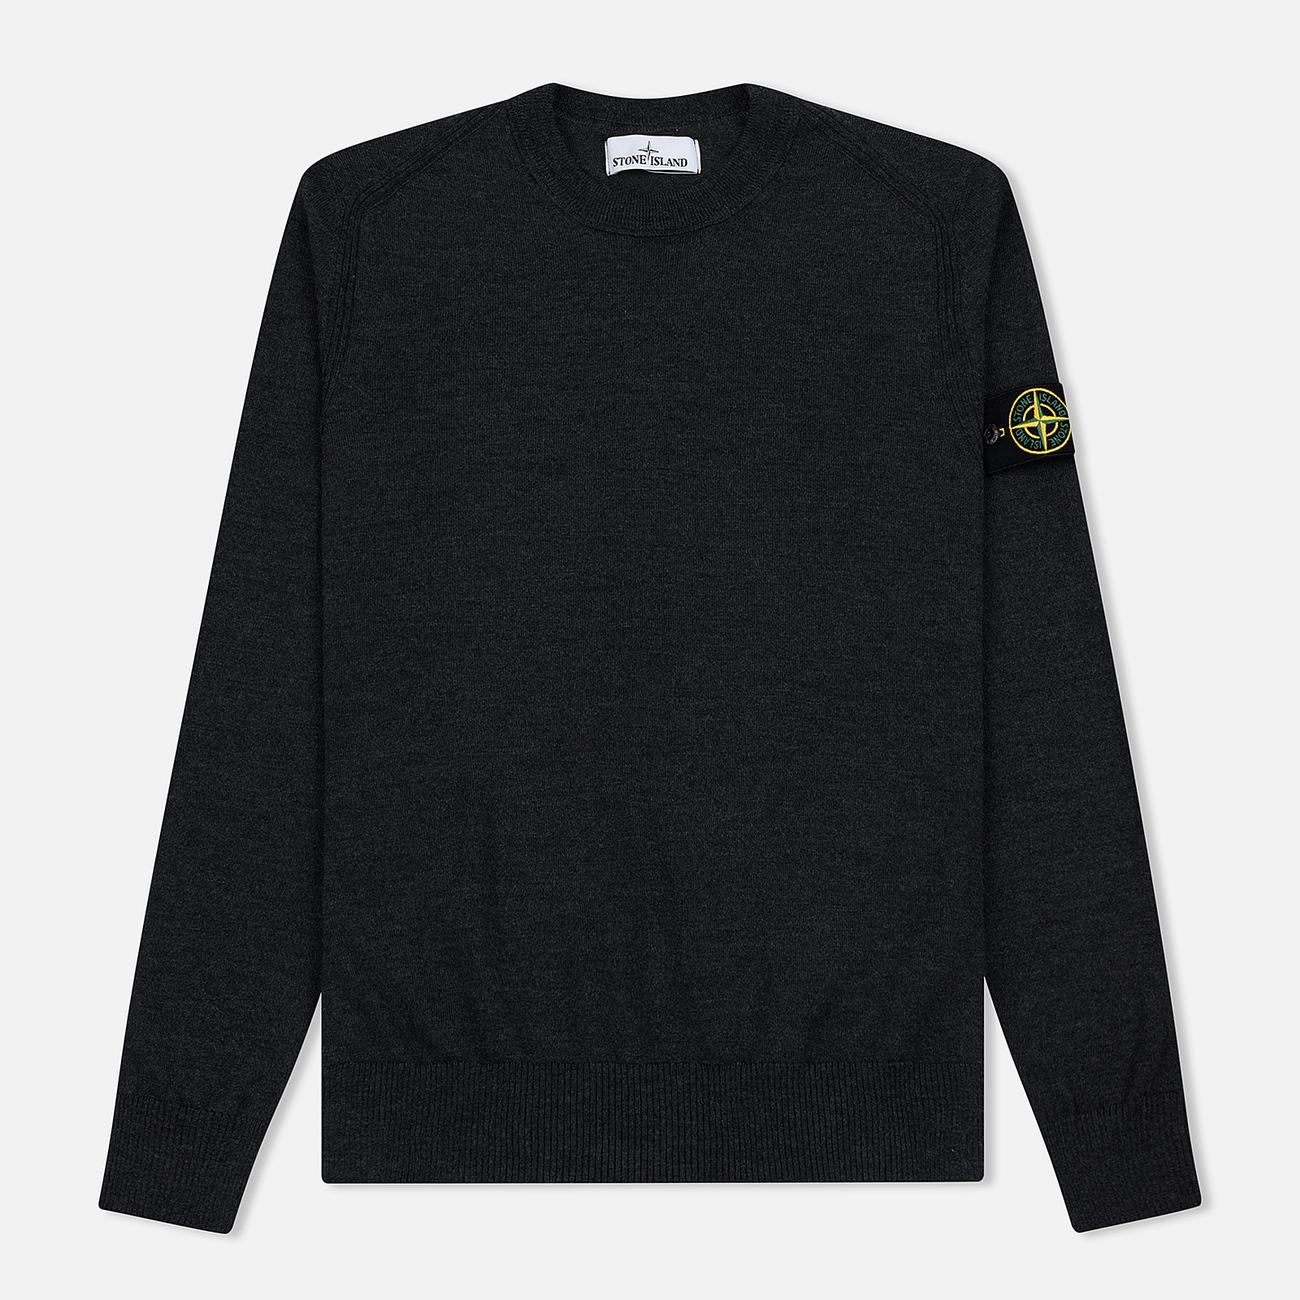 Мужской свитер Stone Island Crew Neck Lightweight Wool Charcoal